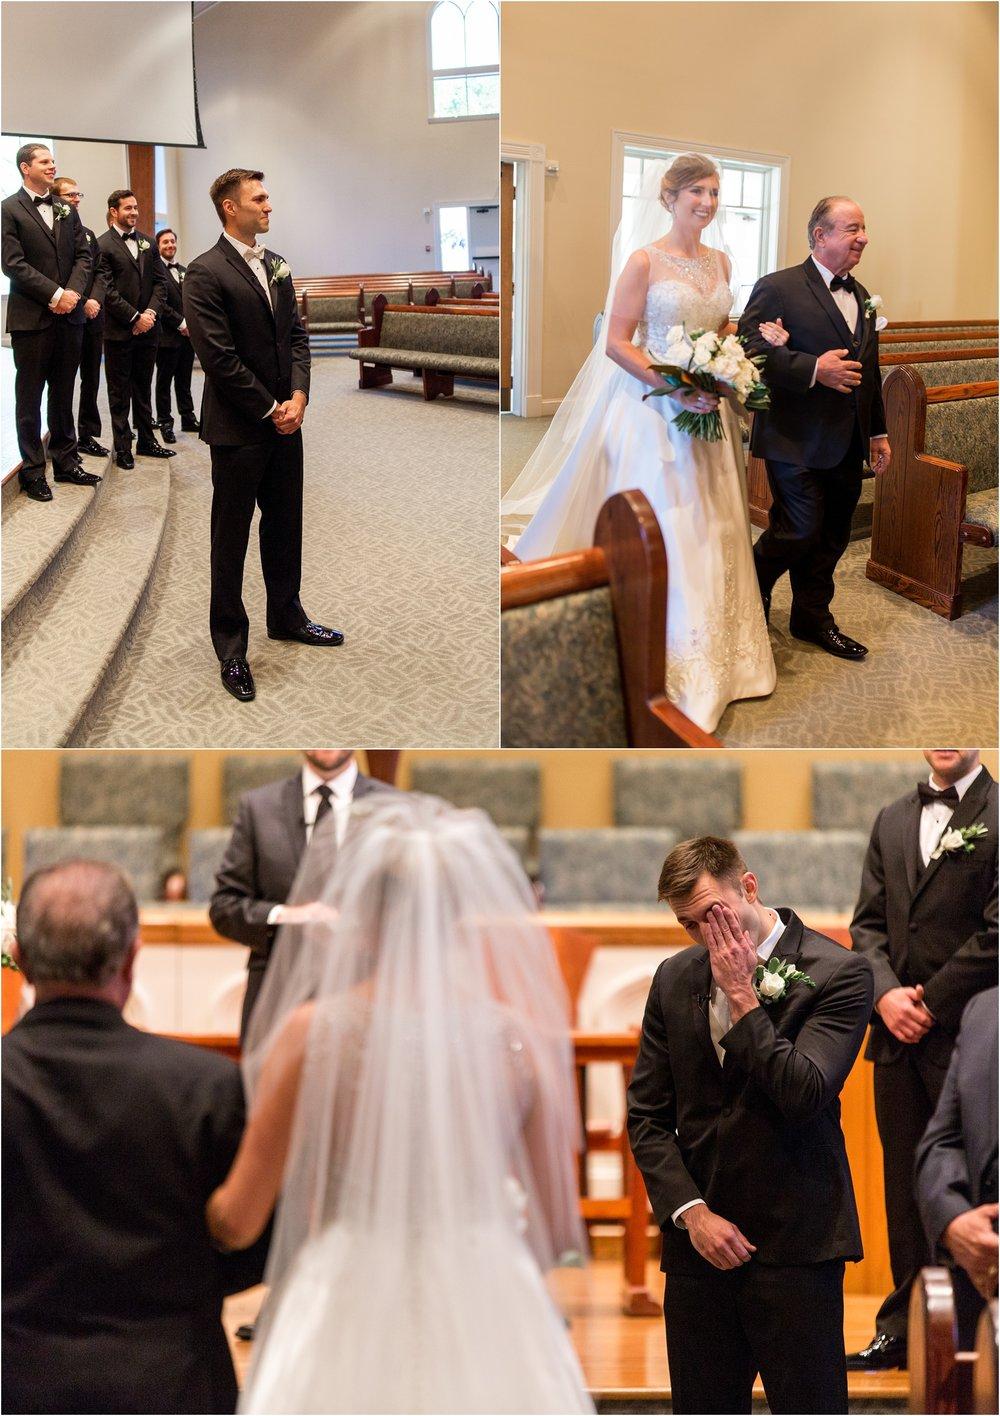 Savannah Eve Photography- Bottiglion-Scope Wedding- Sneak Peek-15.jpg